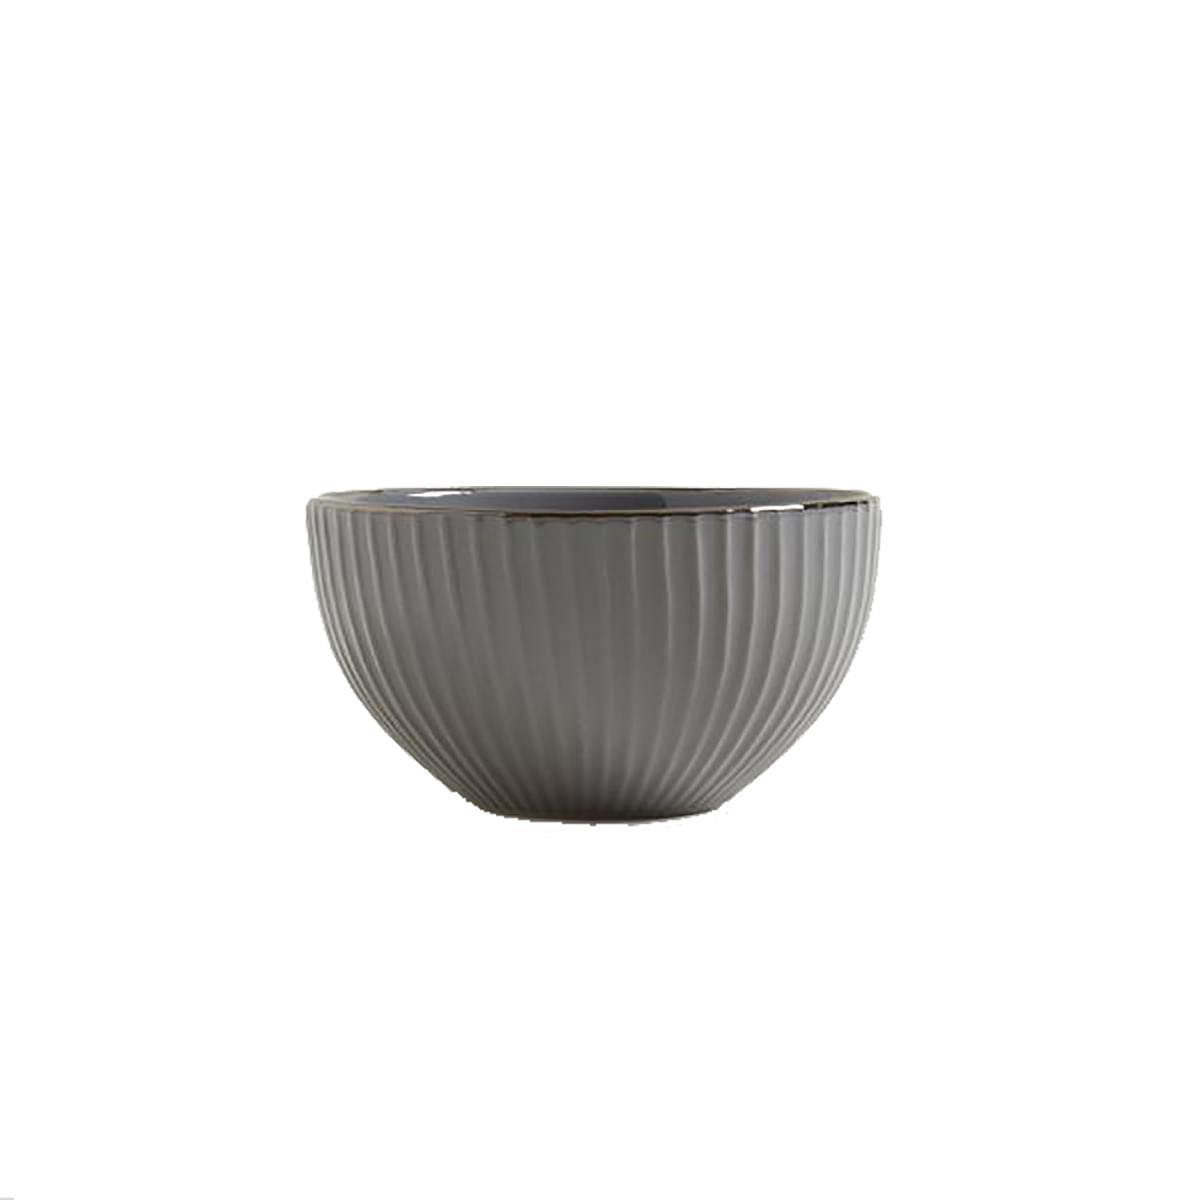 bowl-abu-dhabi